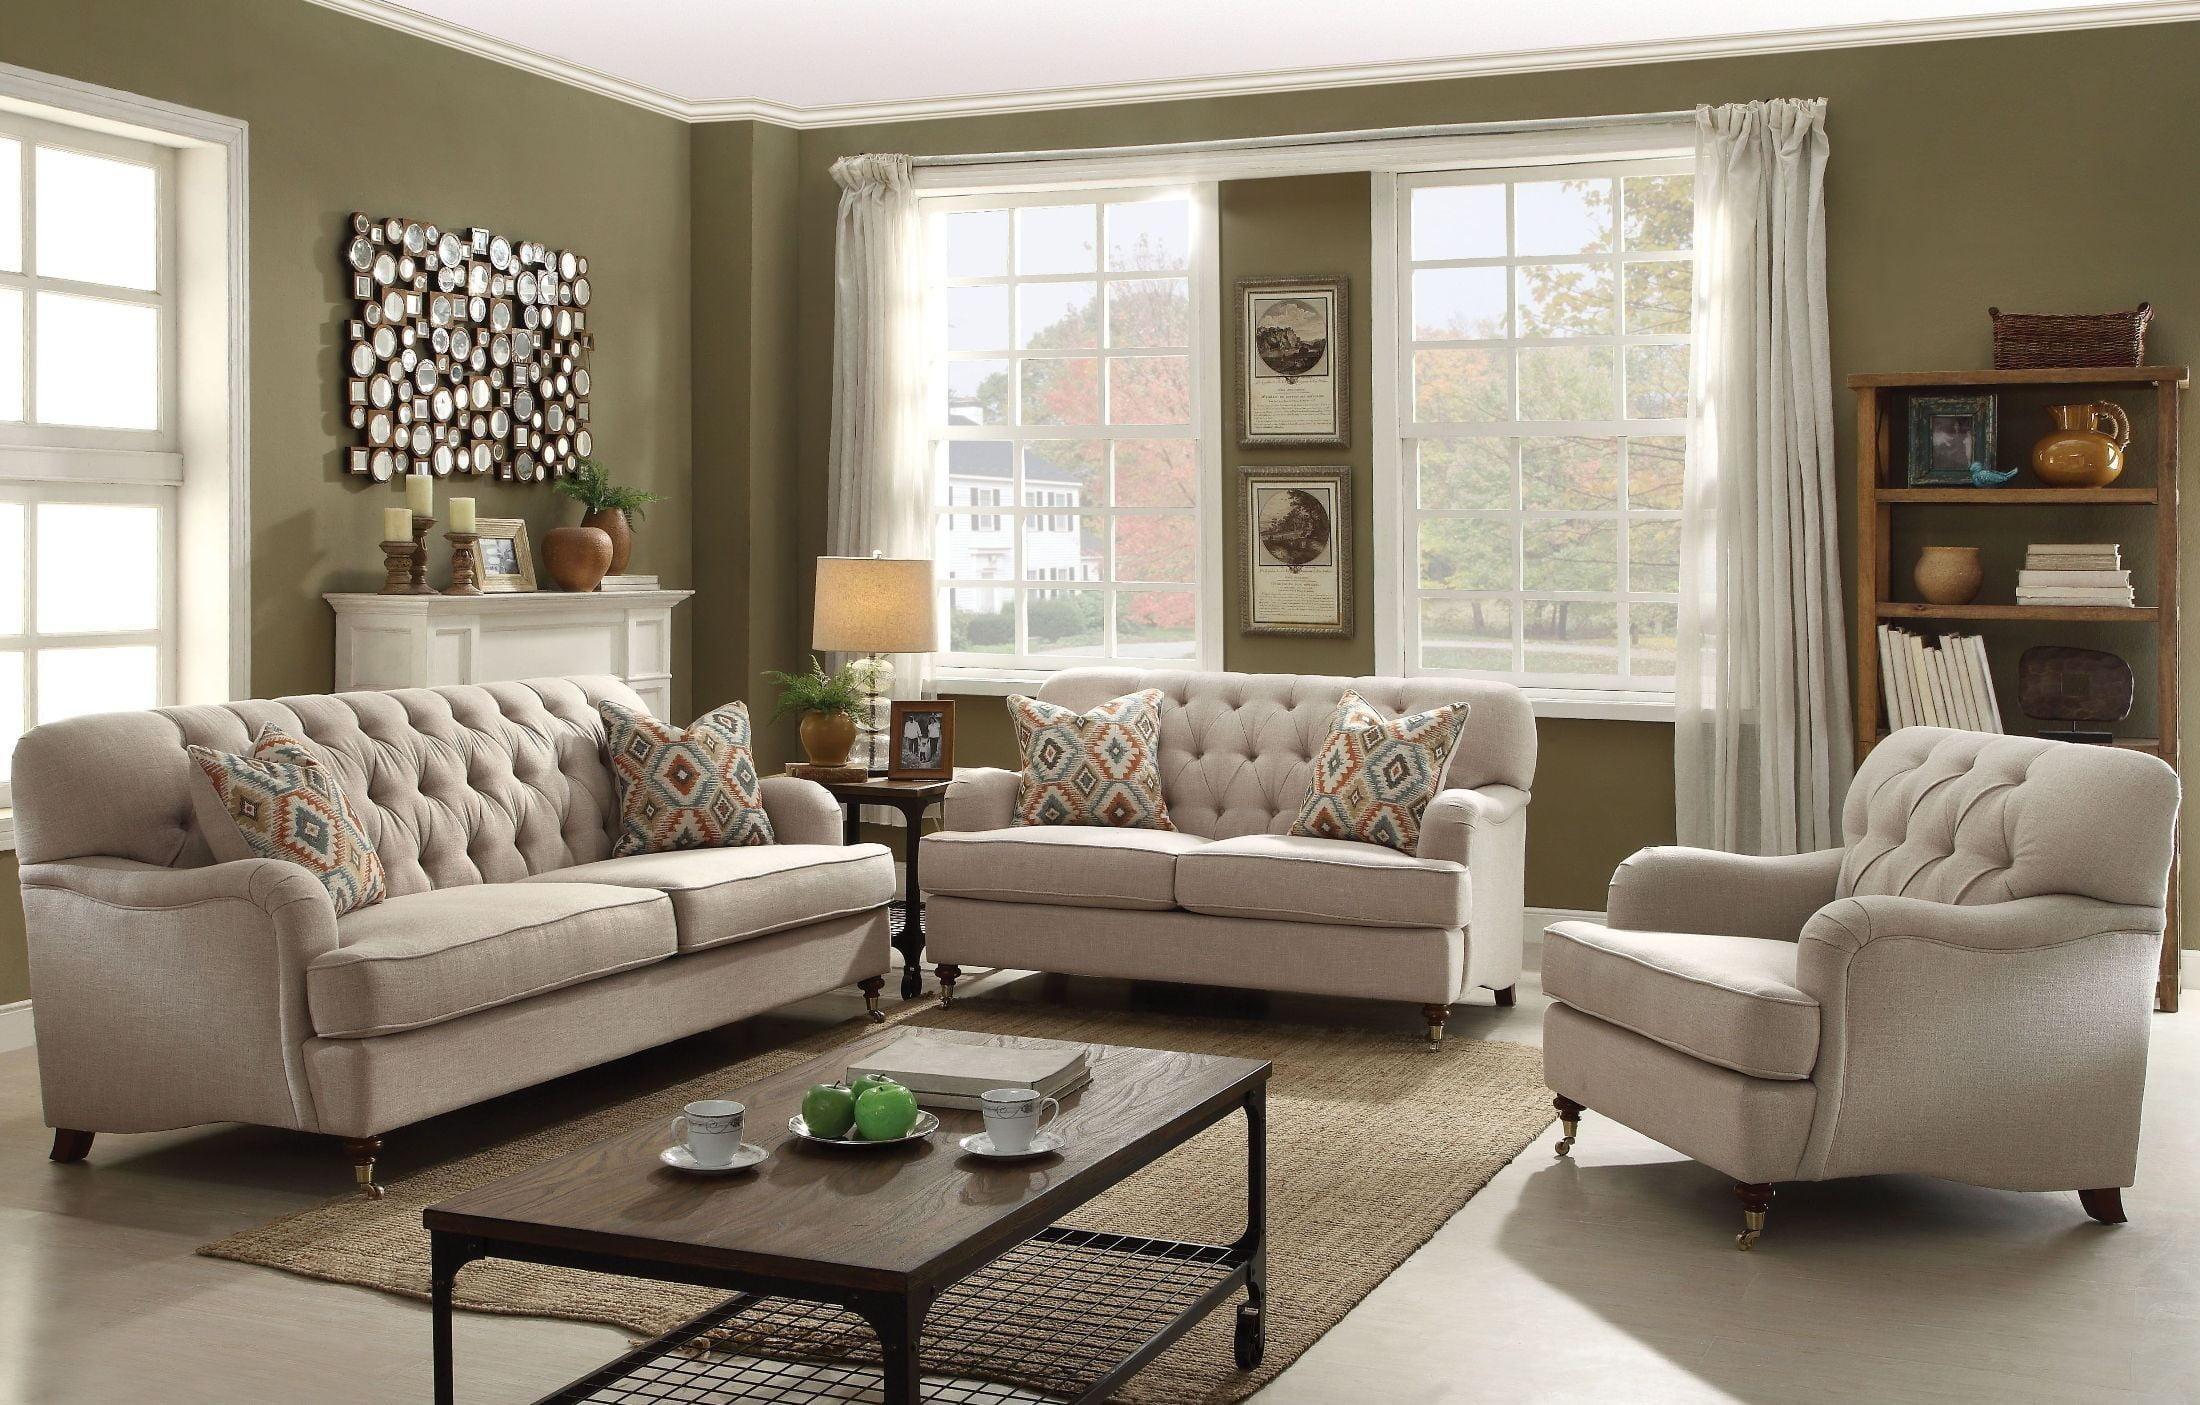 scheme livings and color of best living room terrific beige brown set